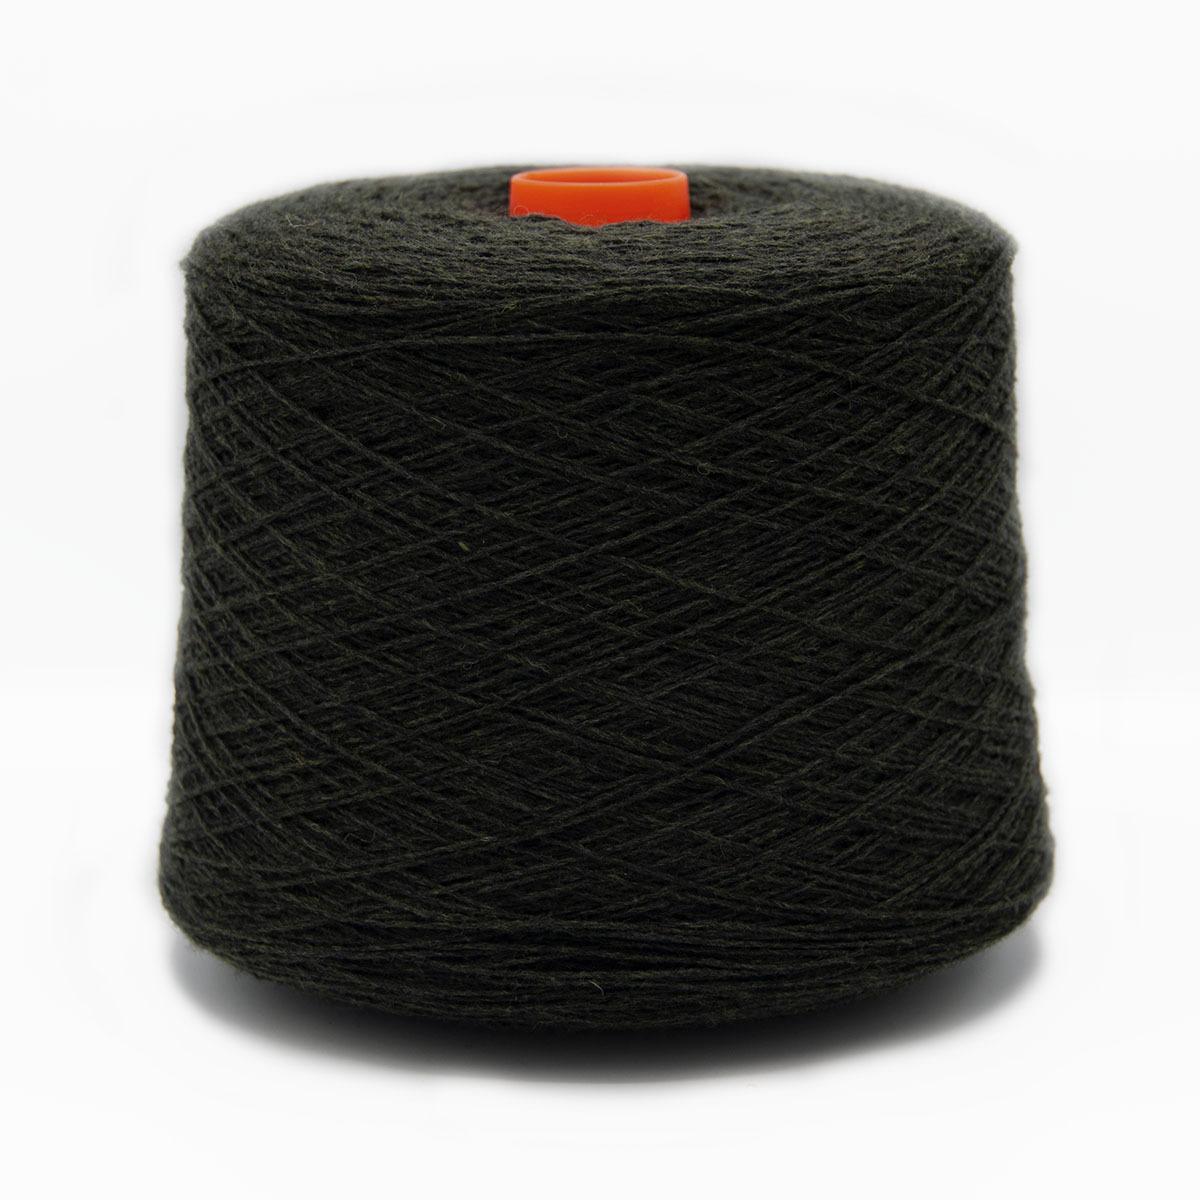 Knoll Yarns Merino Lambswool - 172